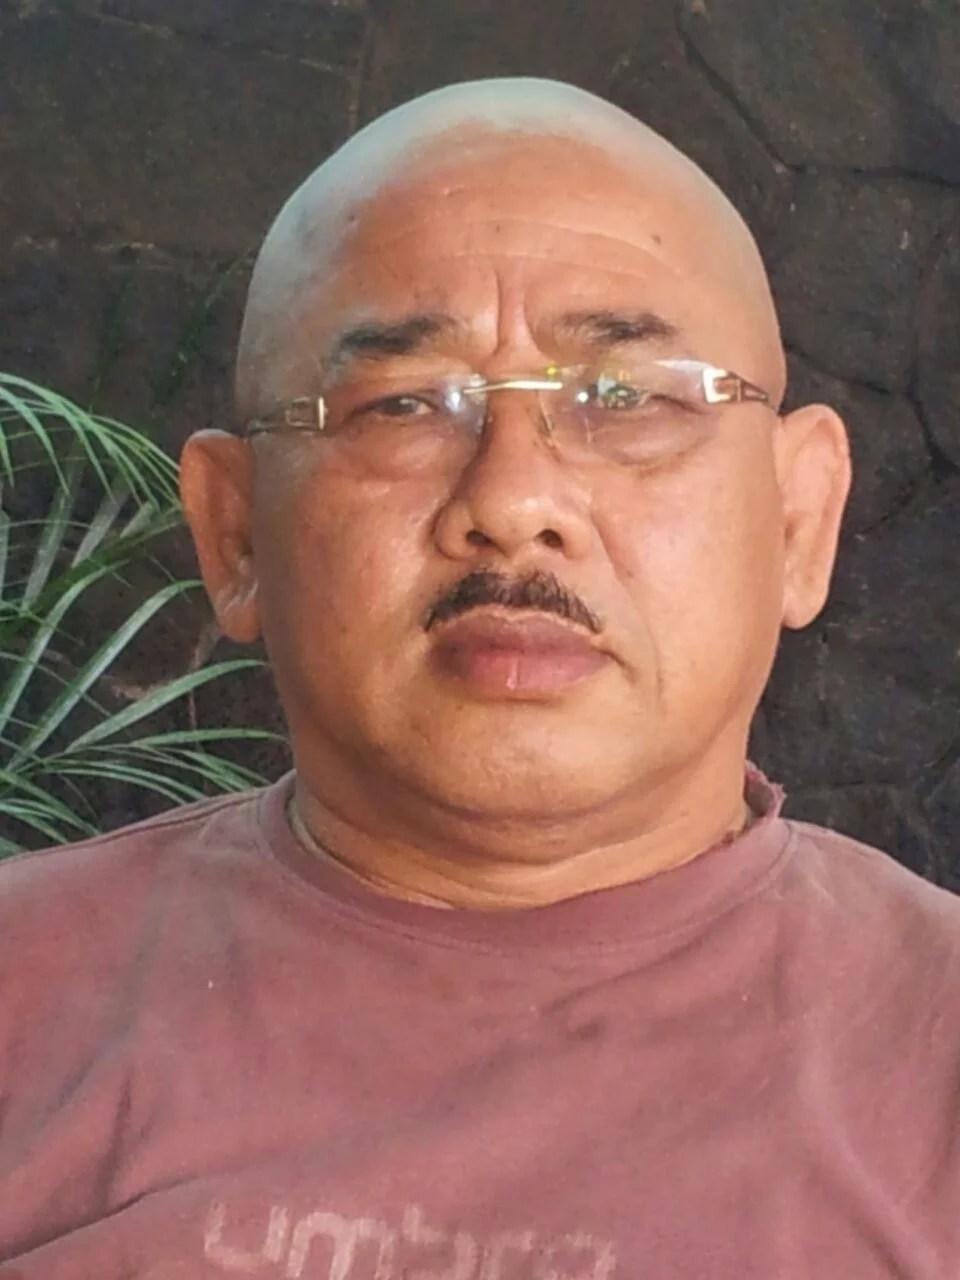 Ketua Kadin Balikpapan: Rusmadi-Safaruddin Pro Terhadap Kemajuan UMKM